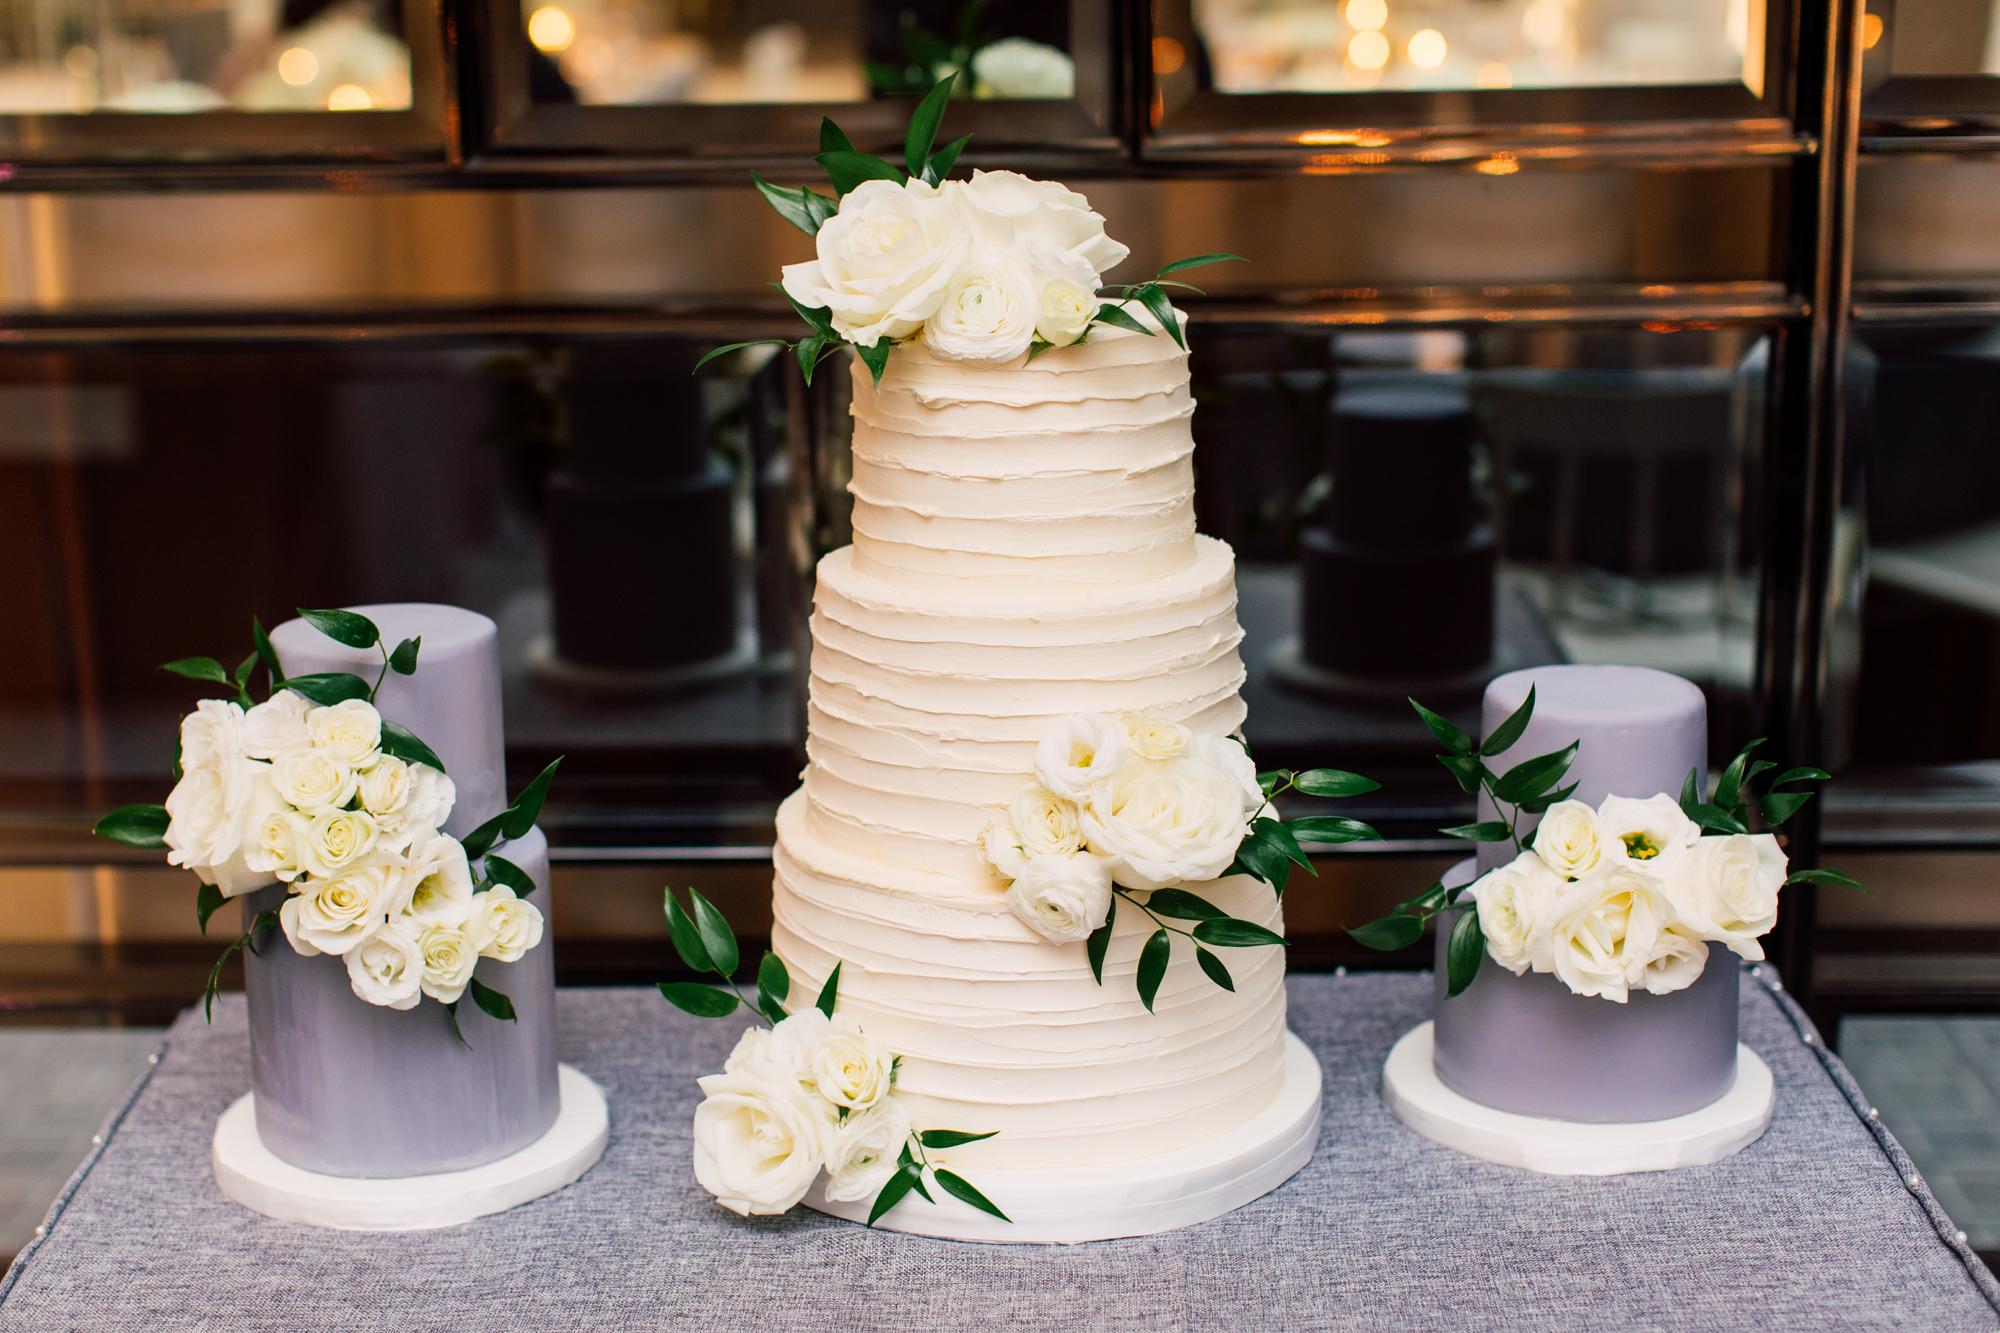 EandR sweetery wedding cake